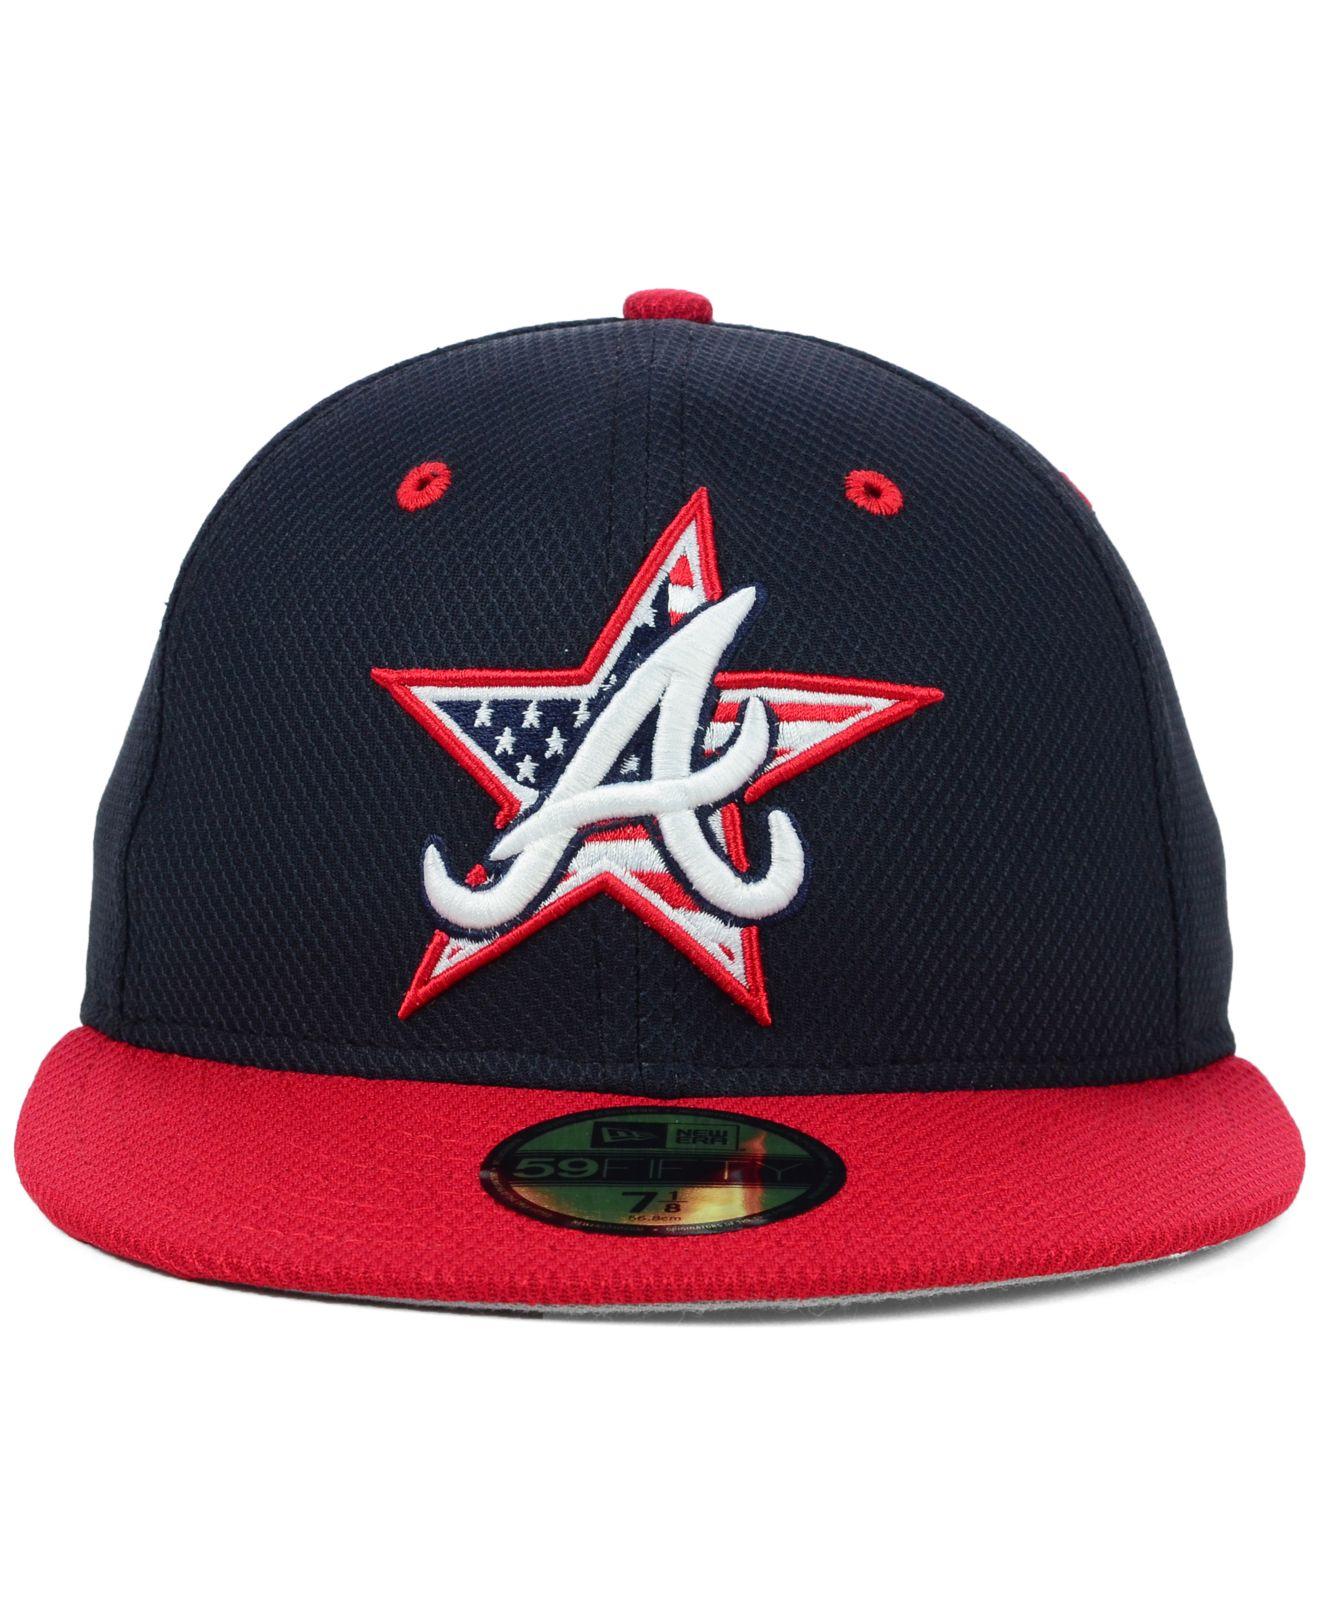 ... mens atlanta braves new era red 2018 stars stripes 4th of july 39thirty  amazon lyst ktz atlanta braves july 4th stars stripes 59fifty cap in 270d3  c4663 ... 7601156251d1